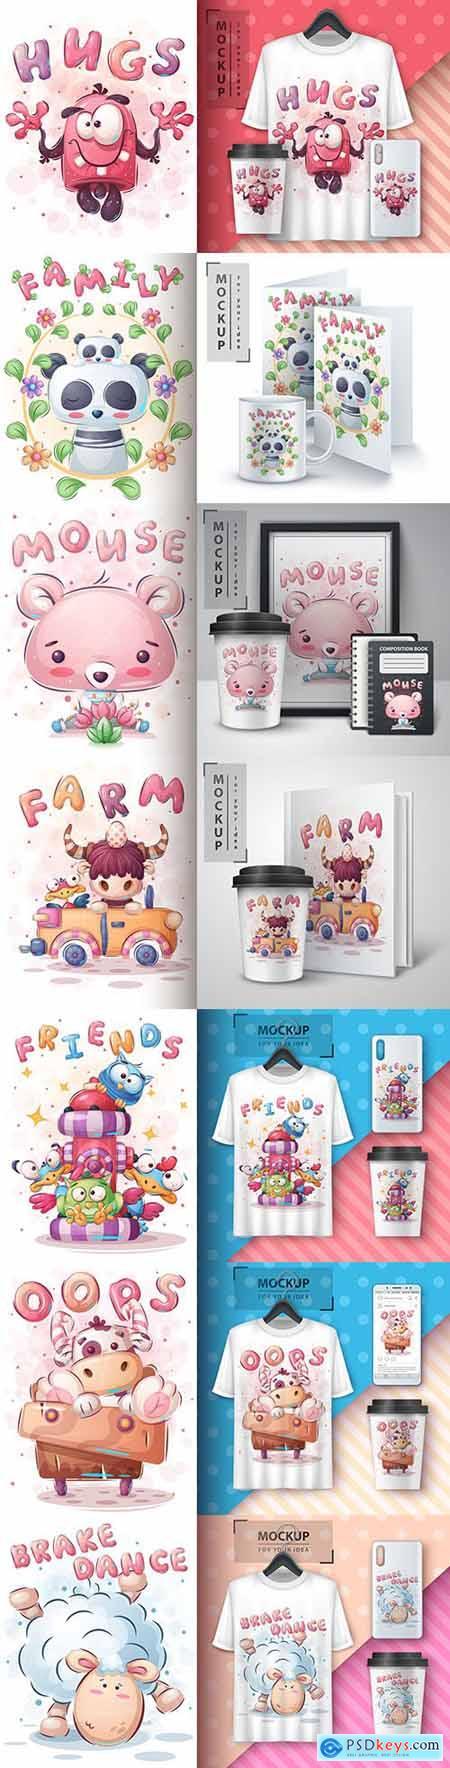 Funny illustration and merchandising mockup print t-shirt 17